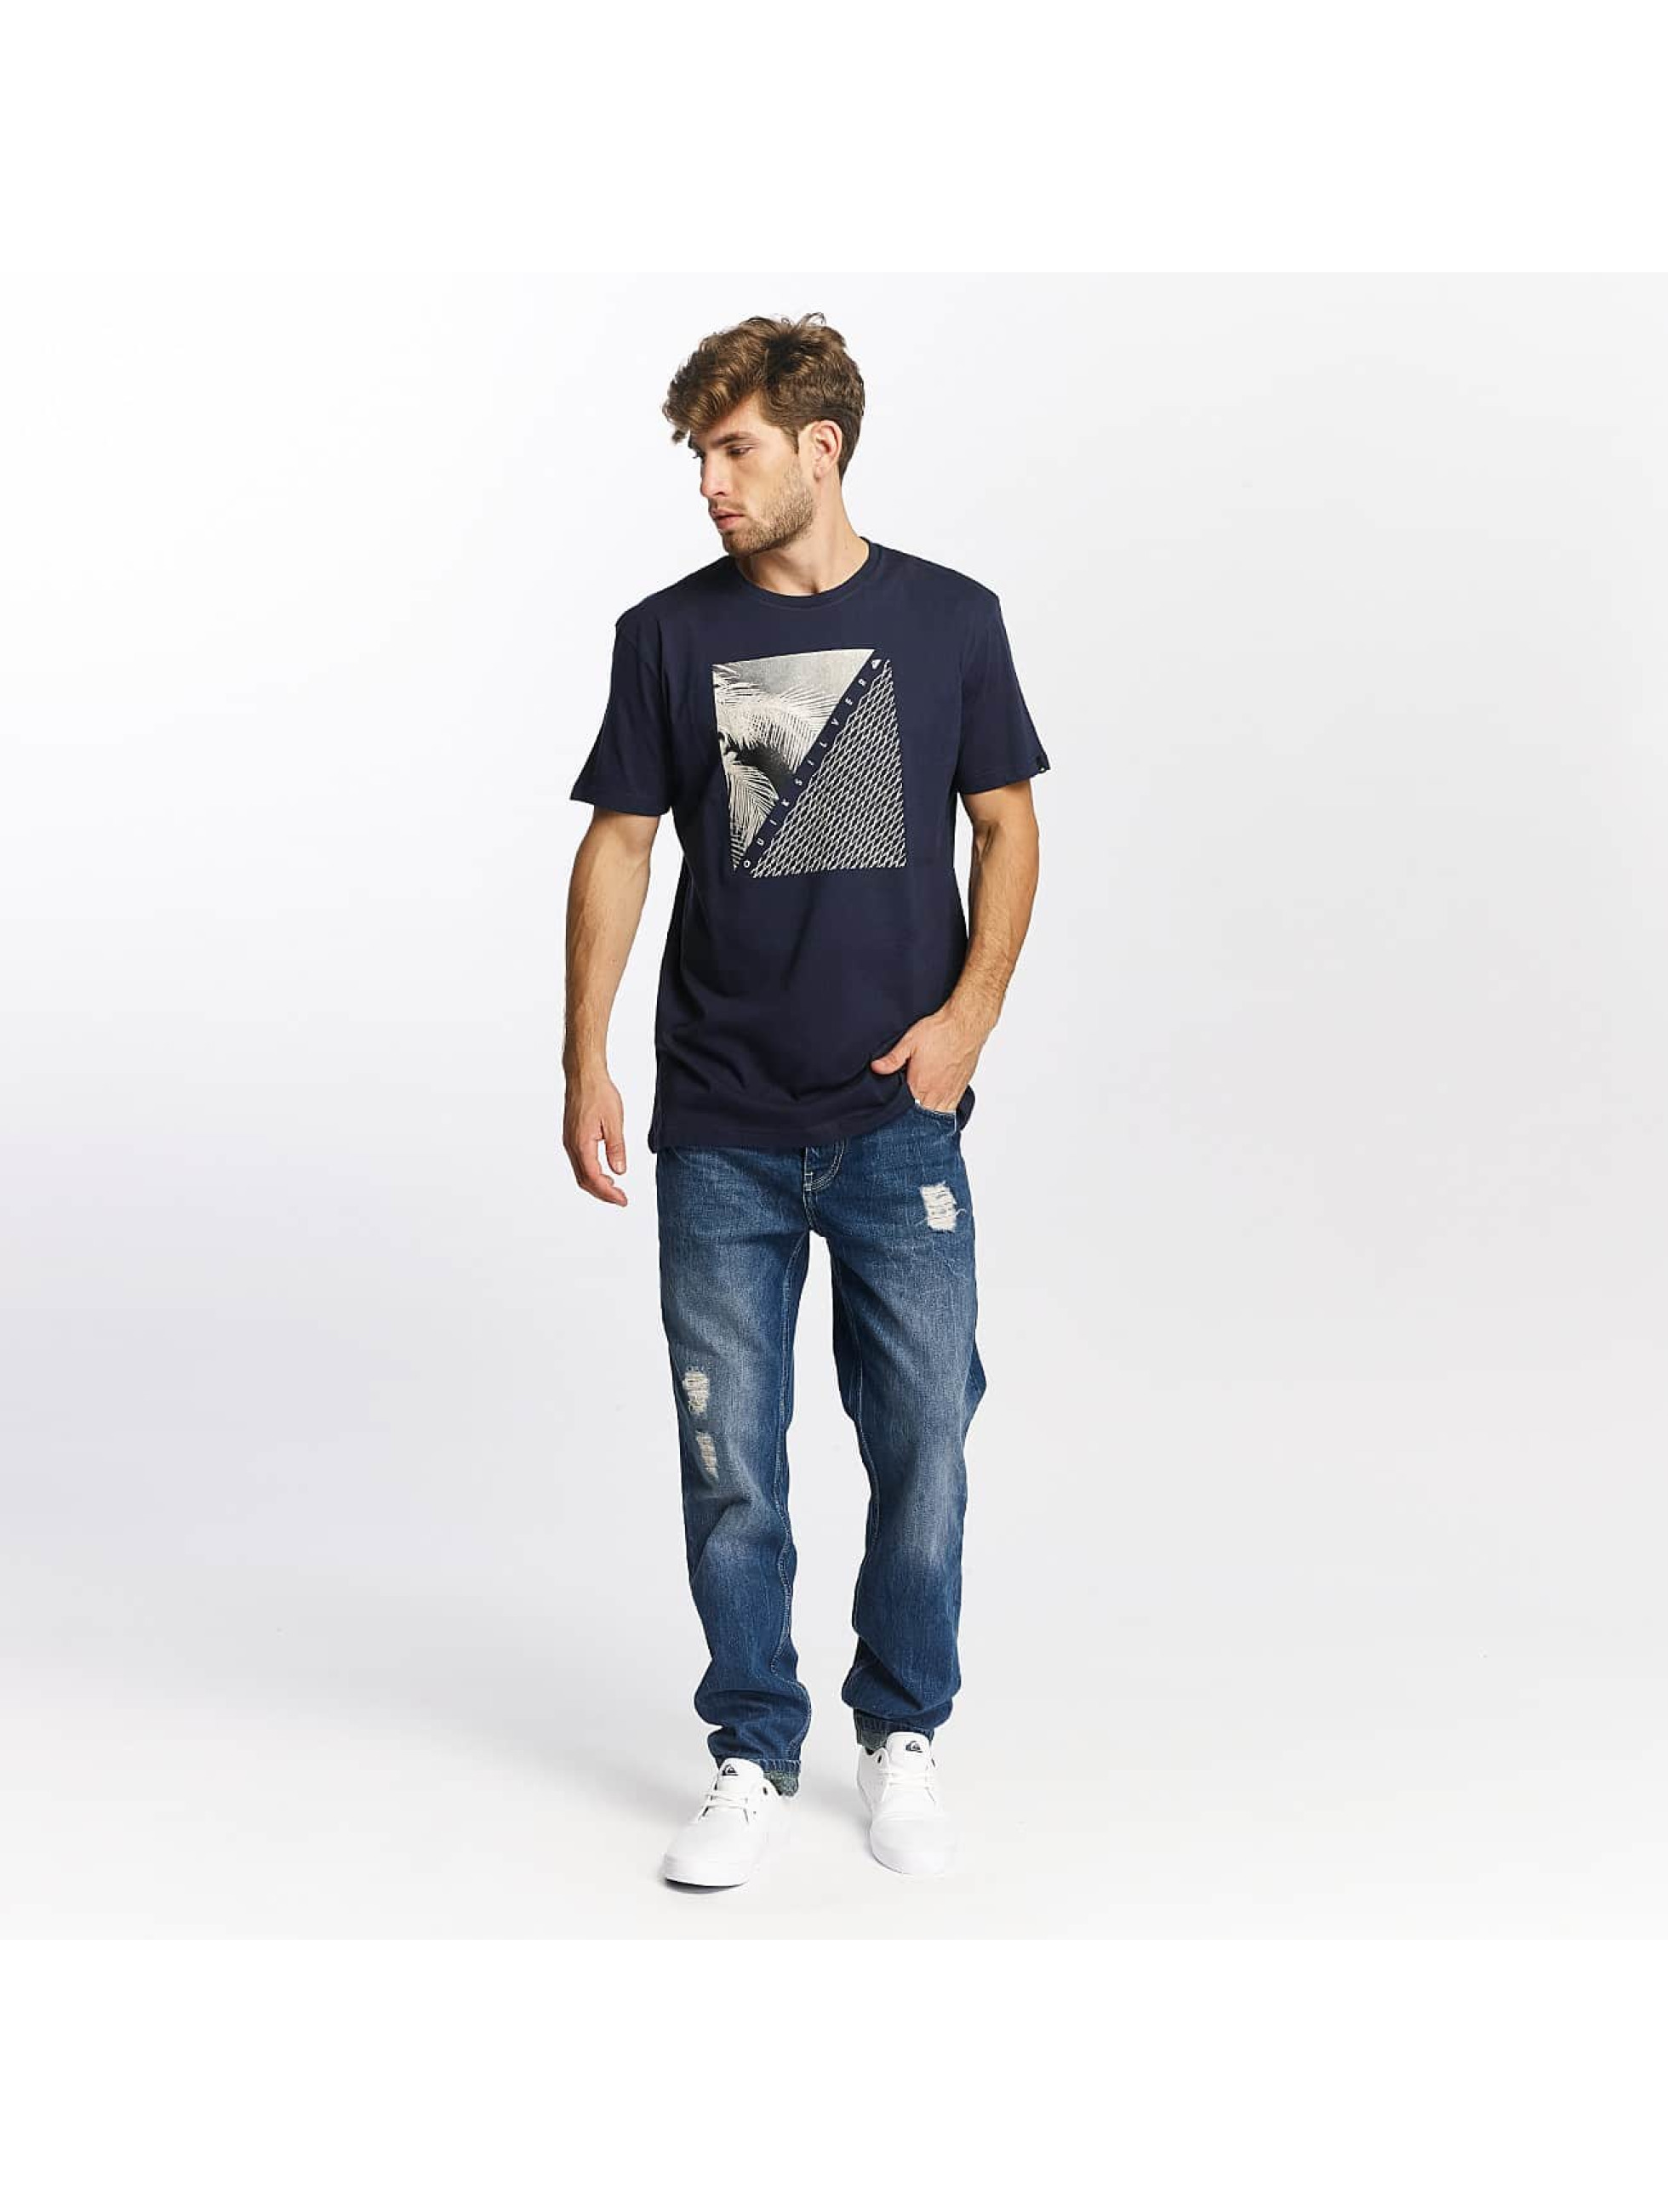 Quiksilver T-Shirt Classic Coast Lines blau